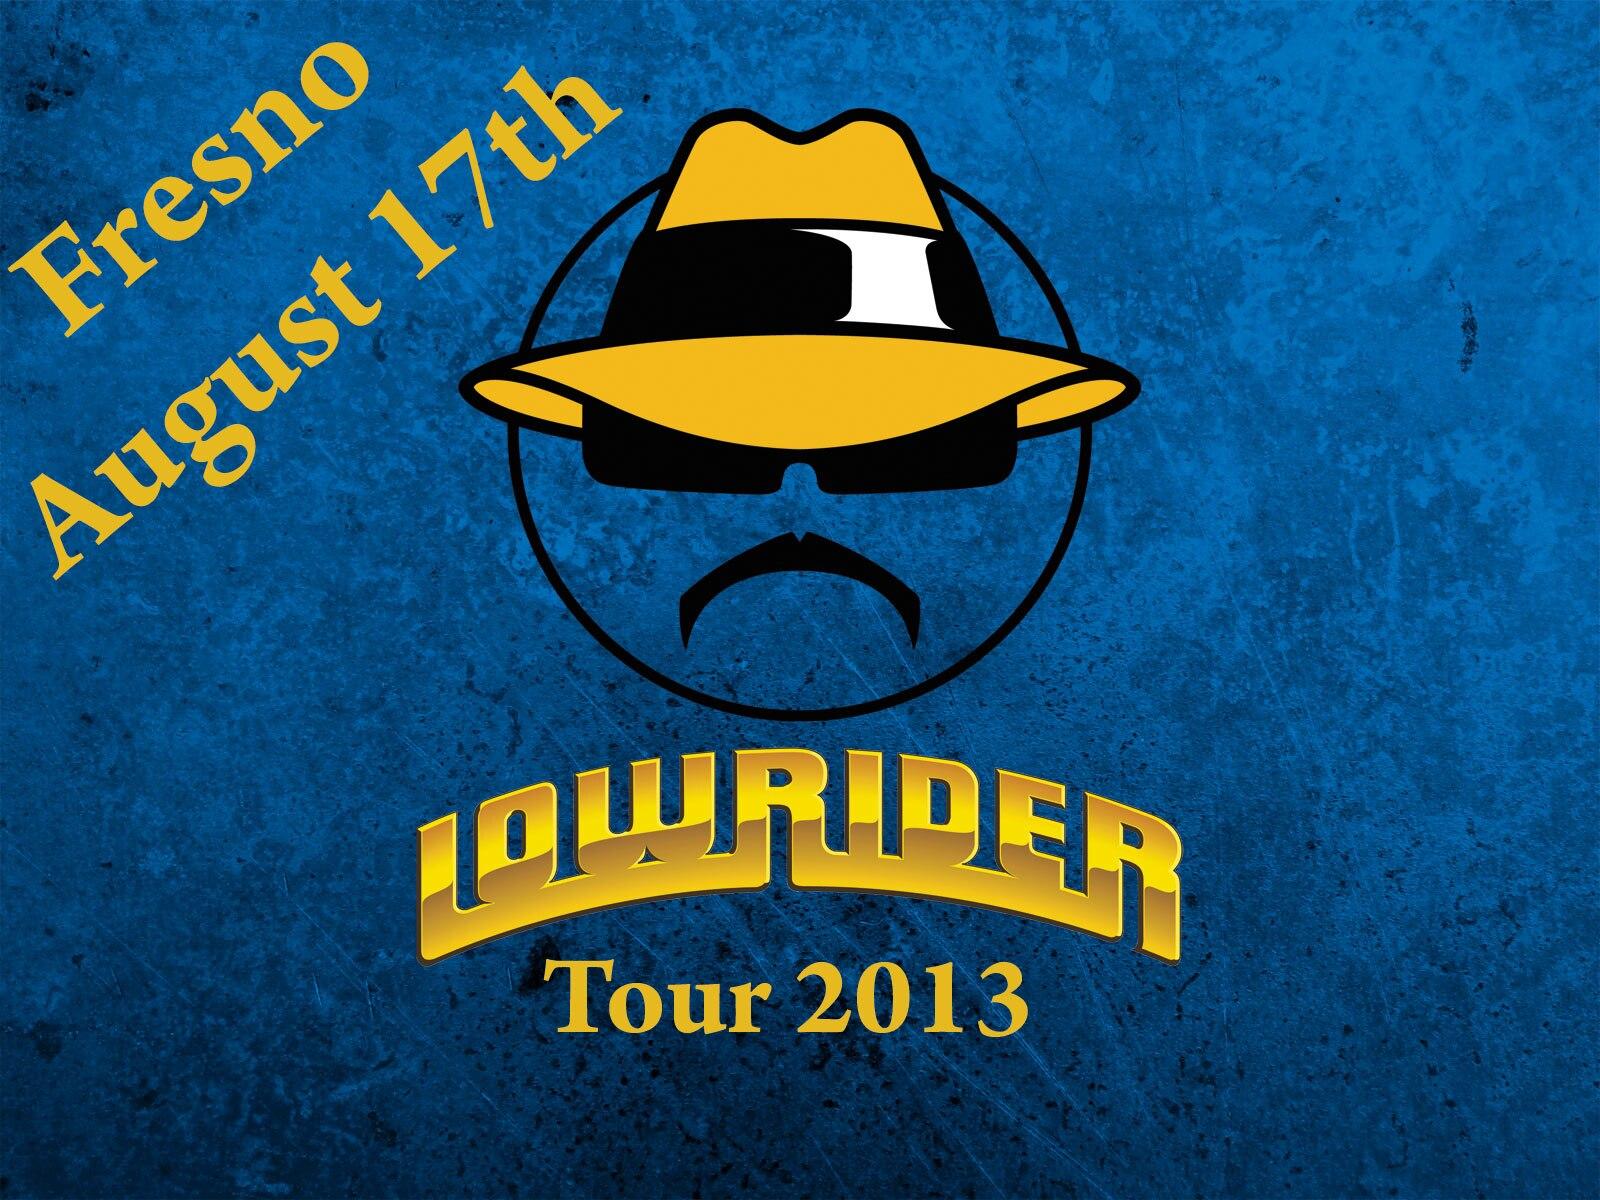 1303-lrmp-01-o-new-stop-2013-lowrider-tour1